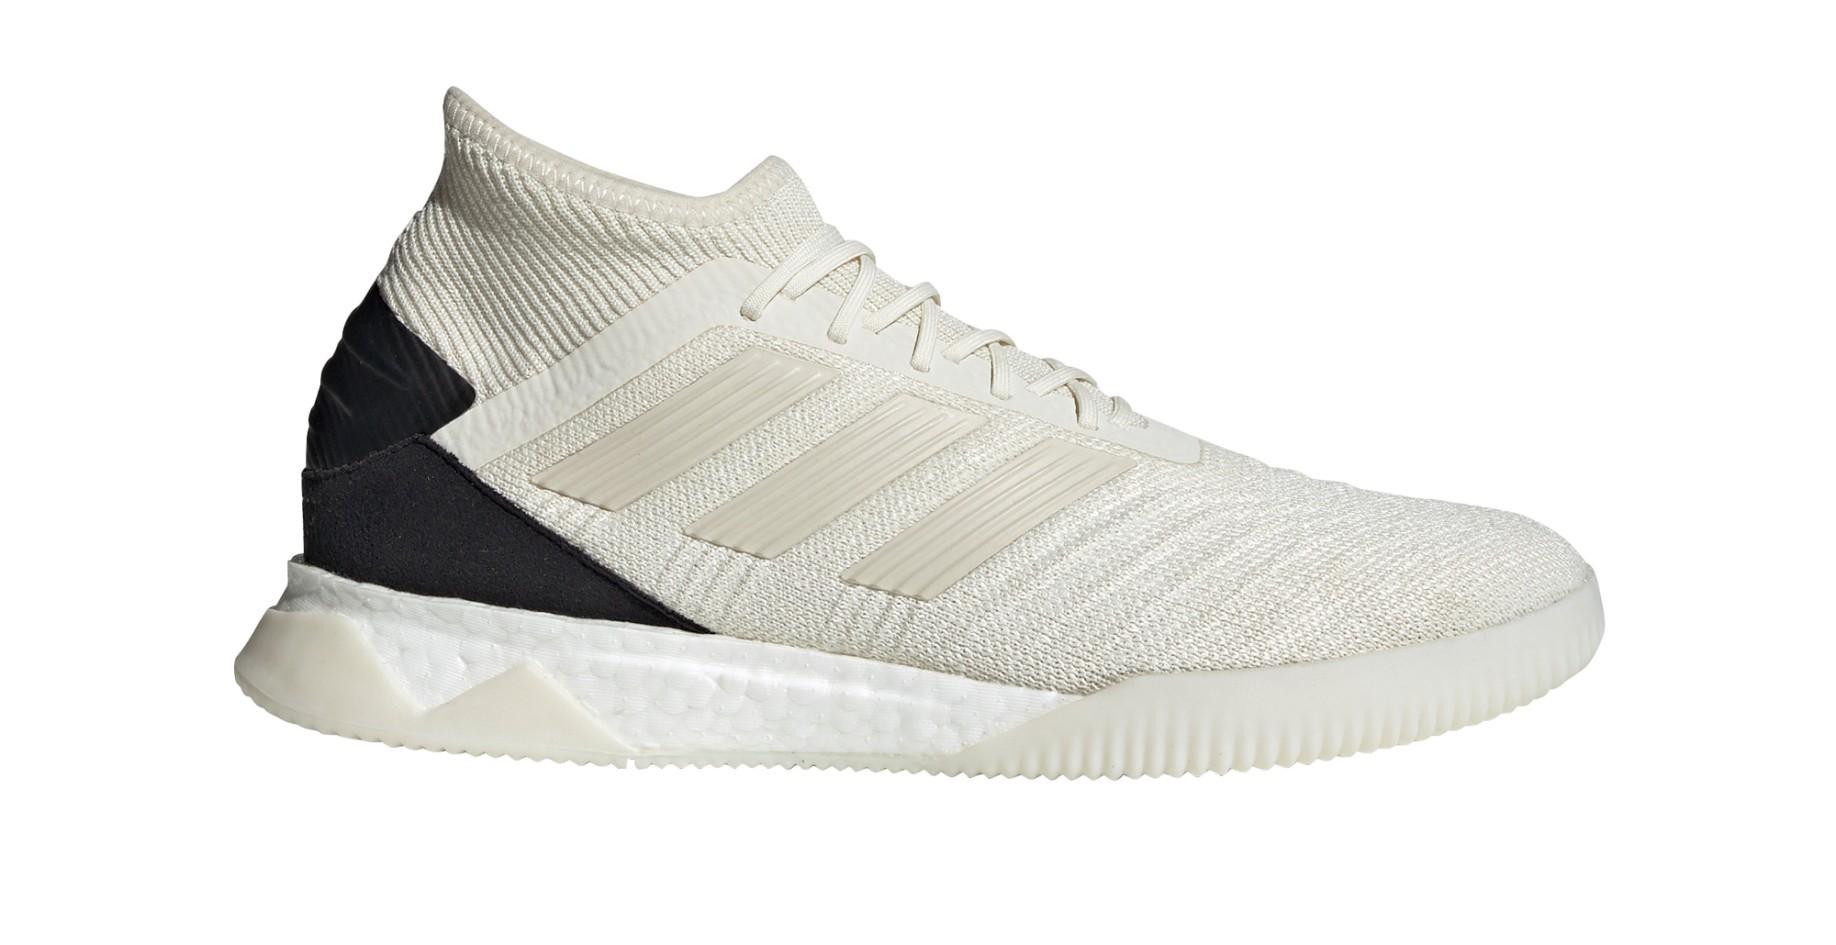 Spogliati Seminare Pebish  Shoes Soccer Adidas Predator 19.1 TR Initiator Pack colore White Black -  Adidas - SportIT.com